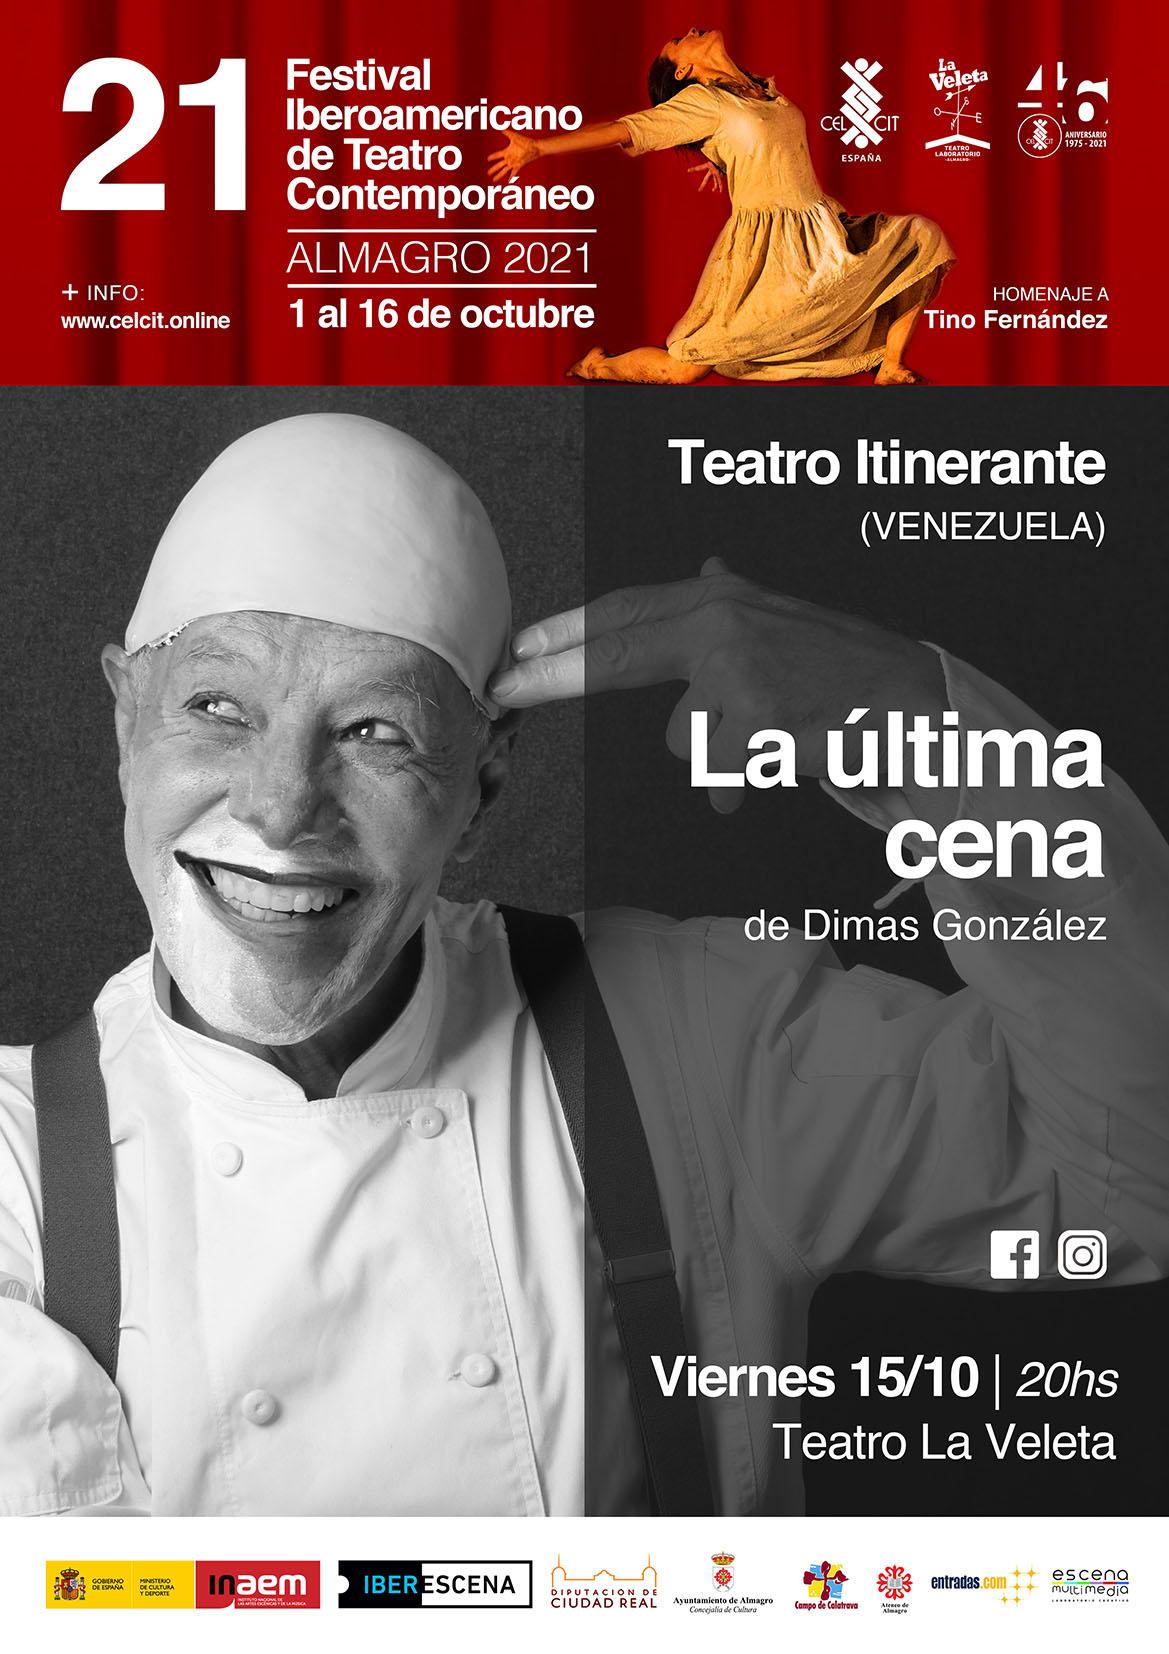 21 Festival Iberoamericano de Teatro Contemporáneo. La última cena (Venezuela)